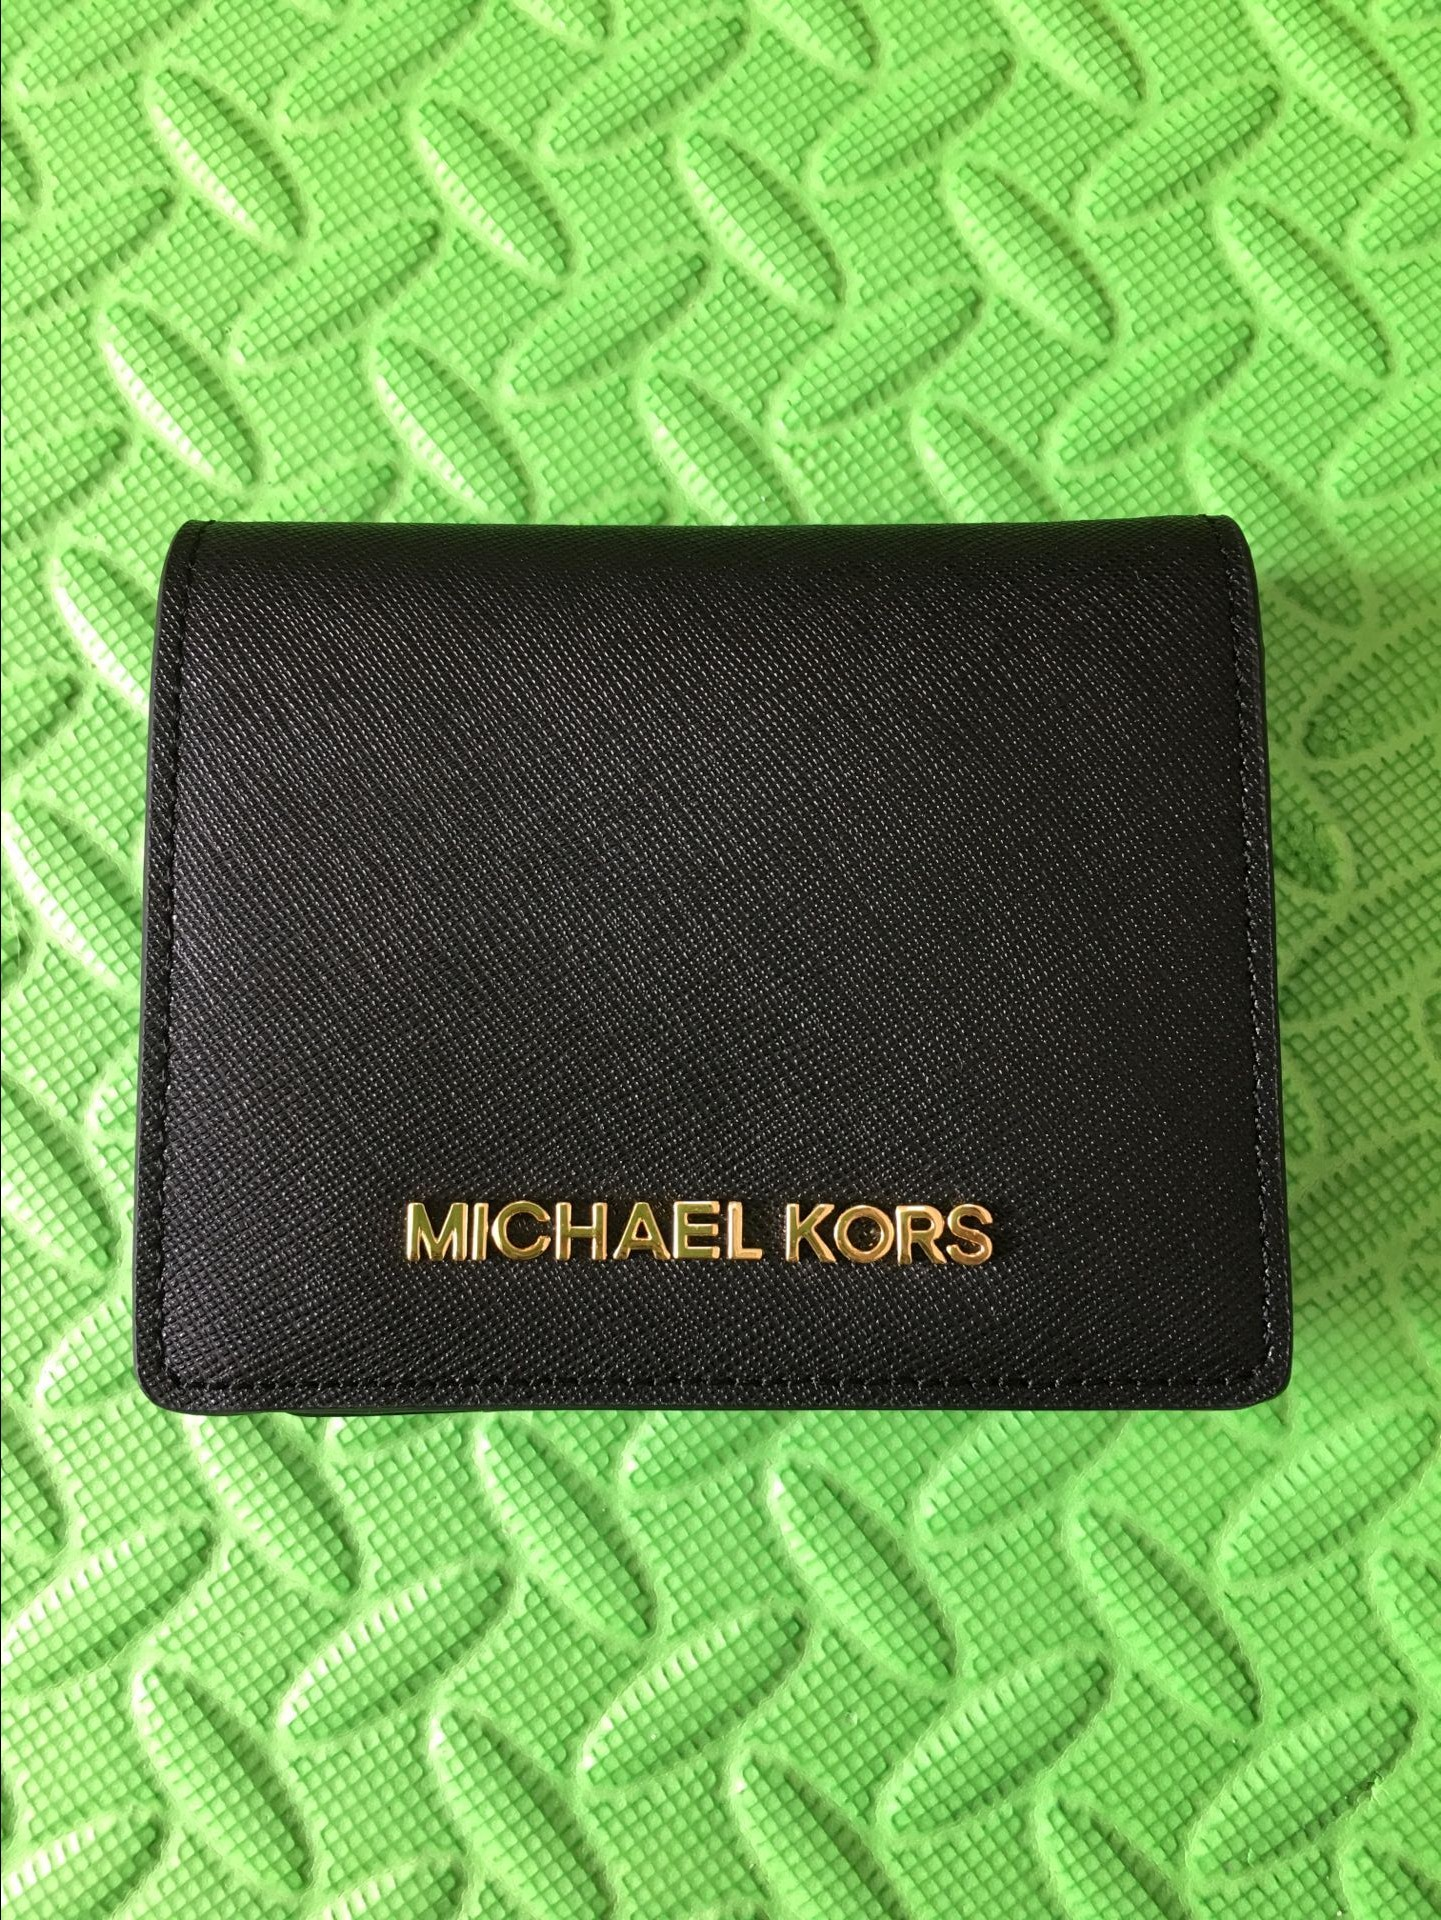 03b4ce094e75 Michael Kors Jet Set Travel Flap Card Holder Wallet Black Authentic ...